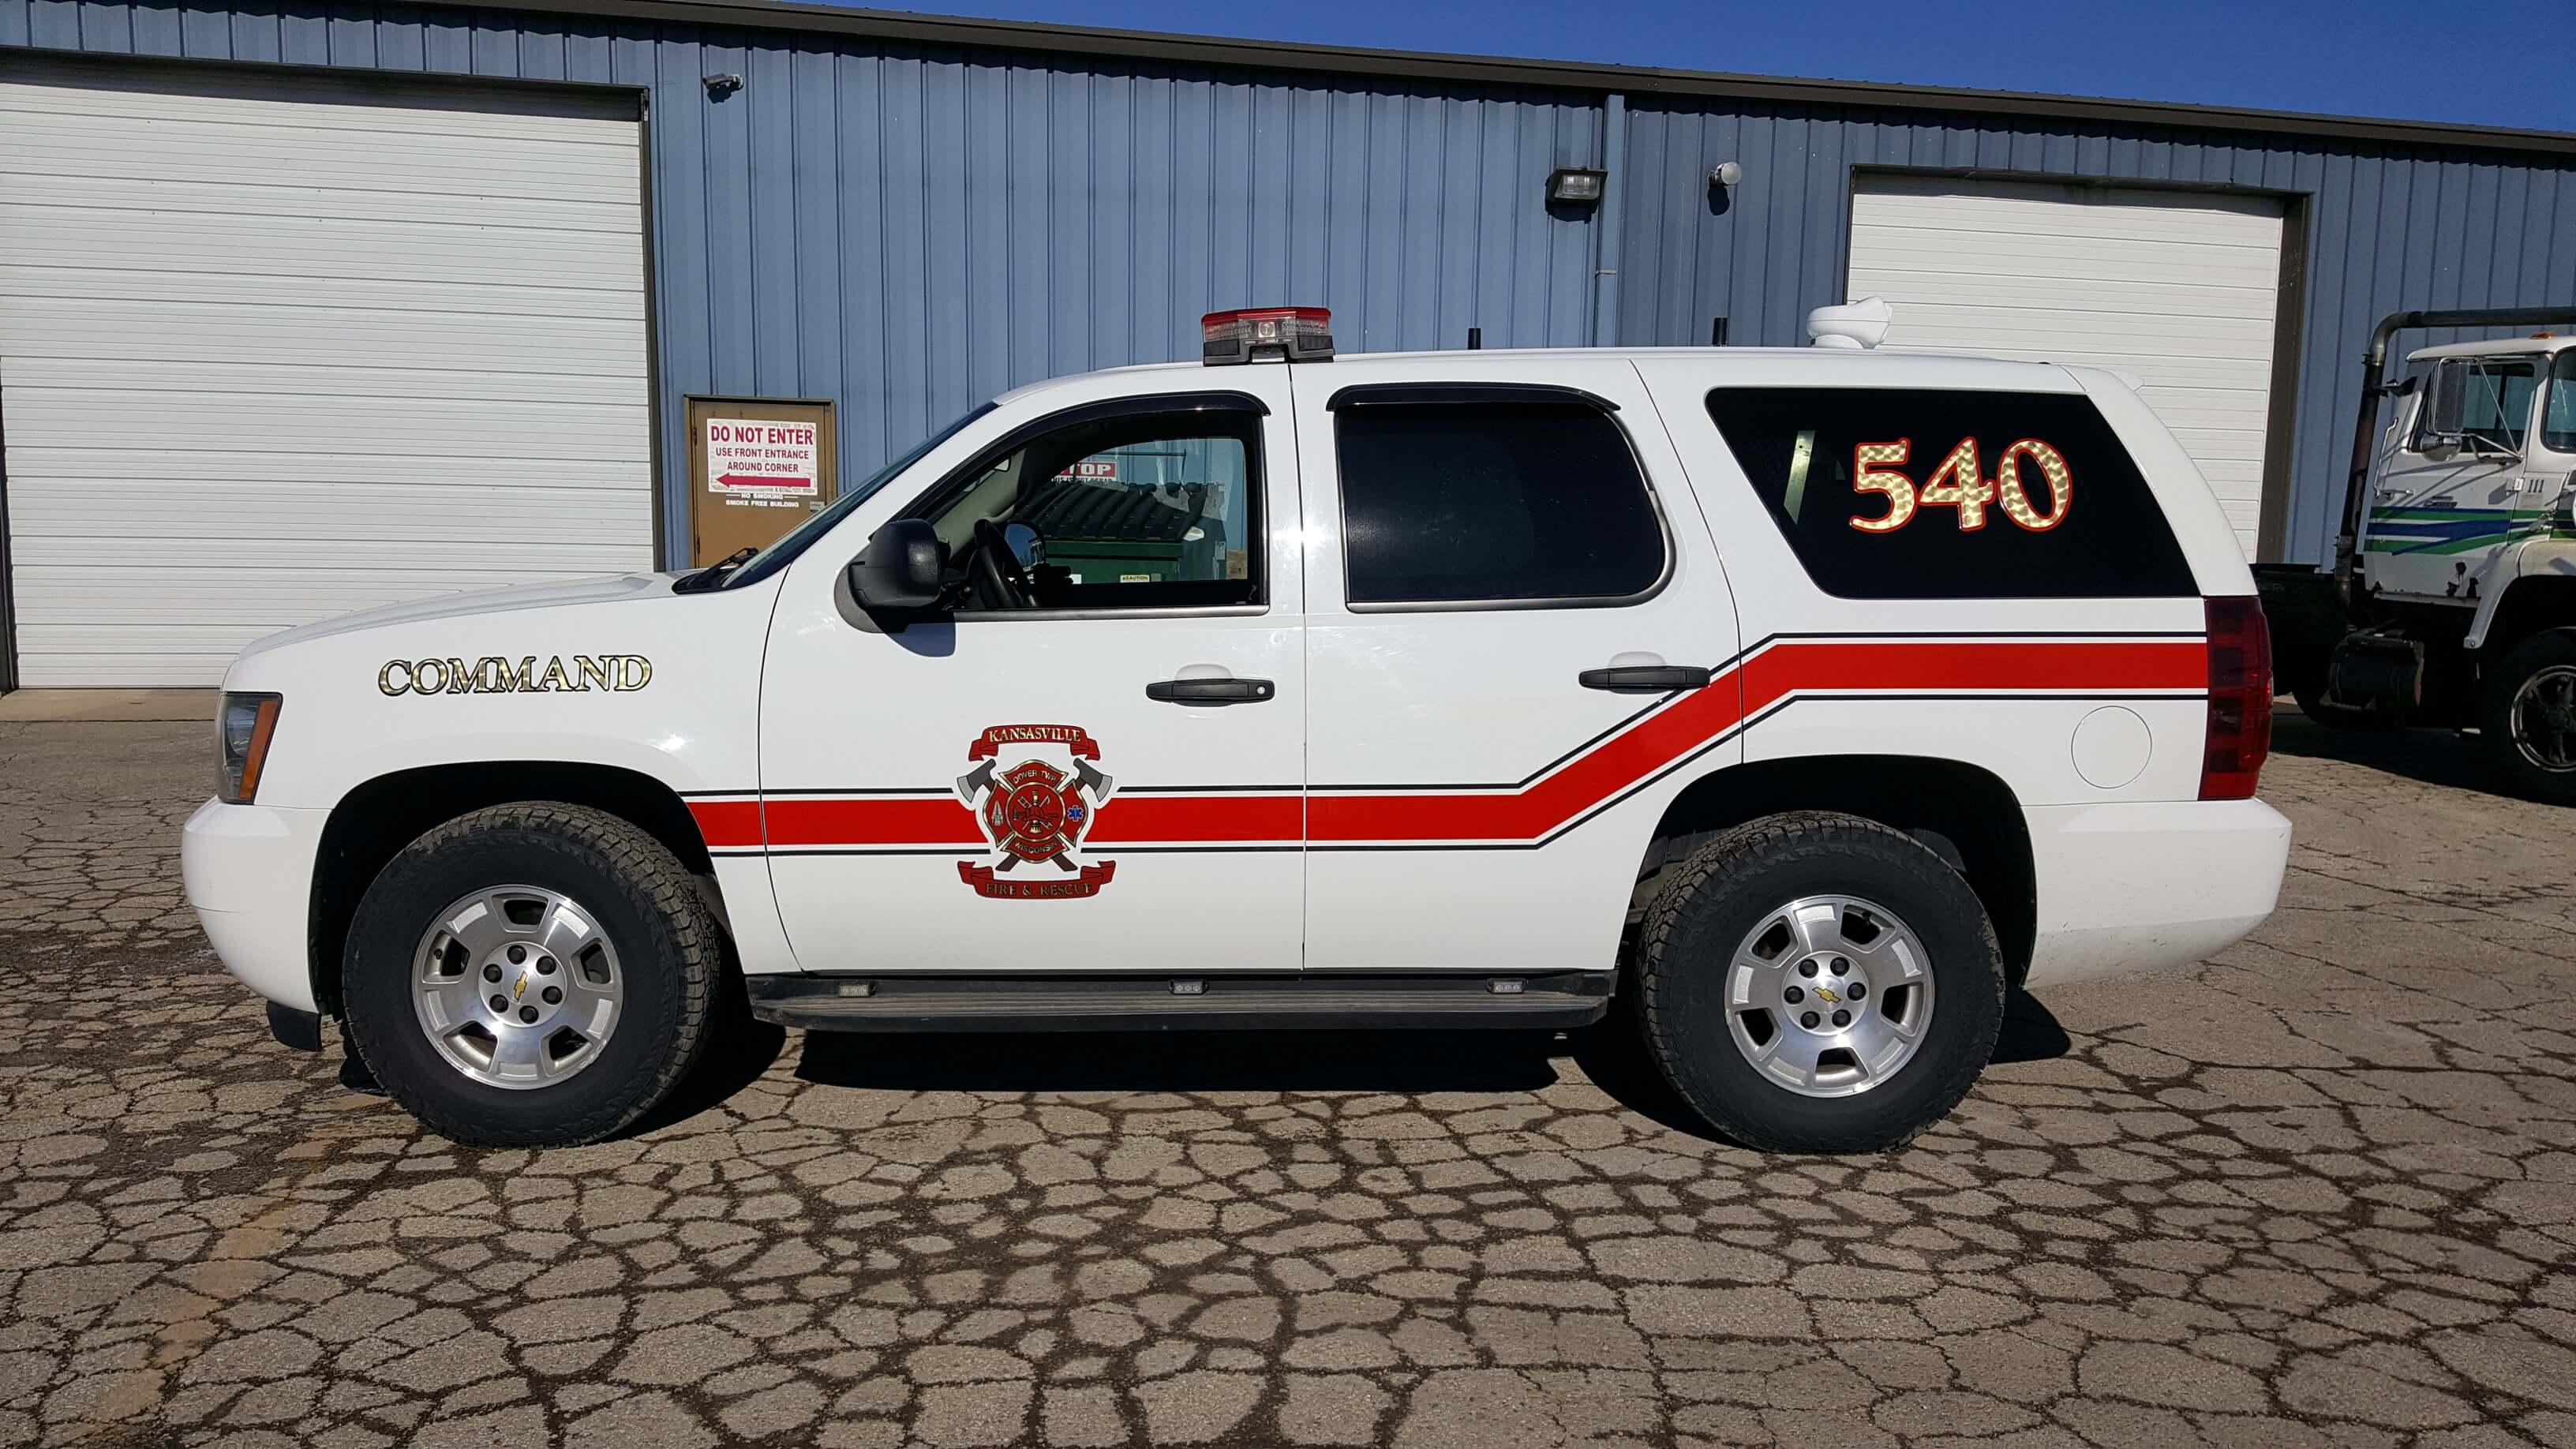 Kansasville Fire Chevrons and Decals